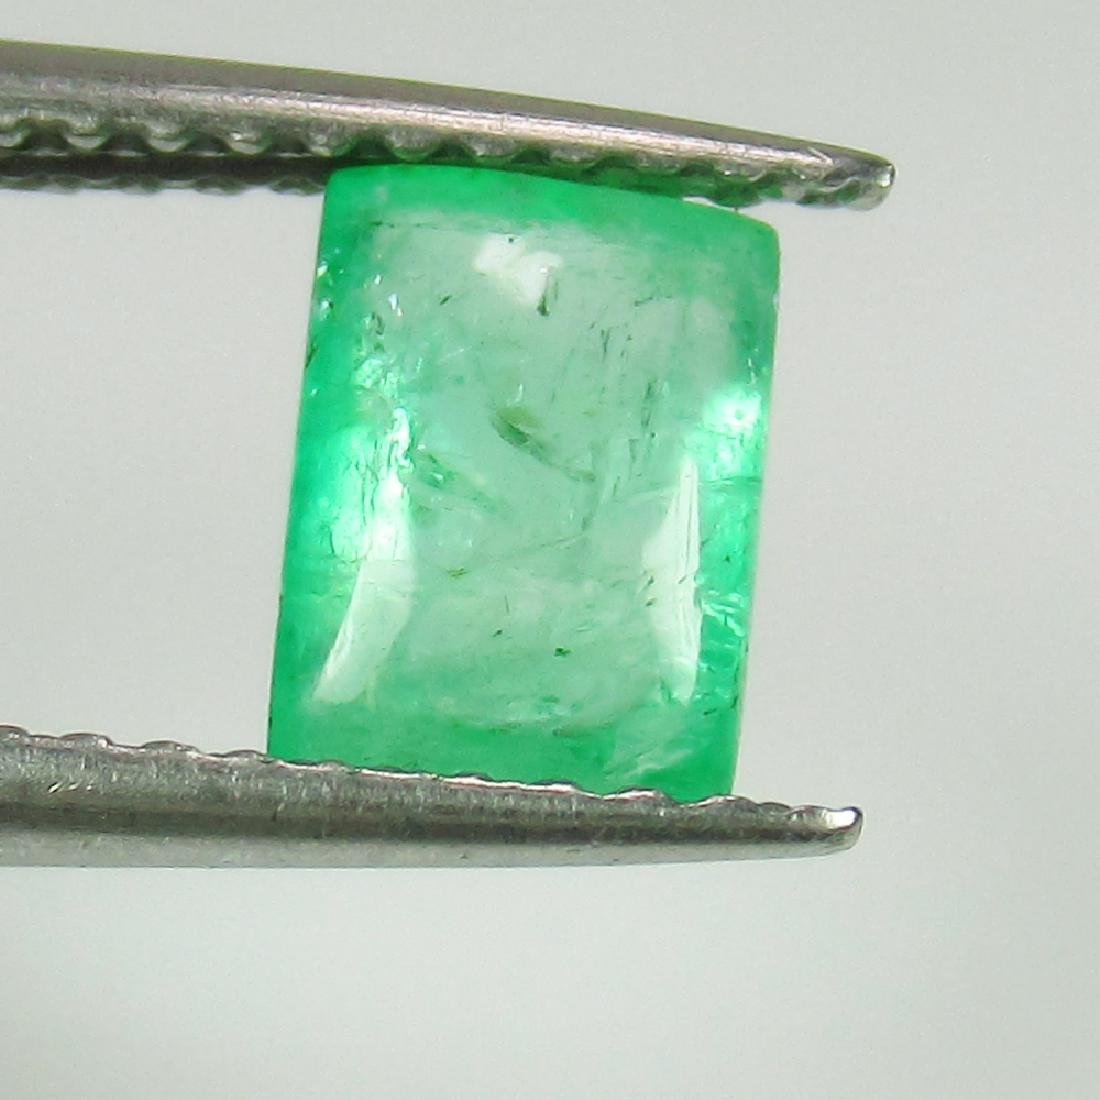 1.06 Ct Genuine Zambian Emerald Nice Rectangle Cabochon